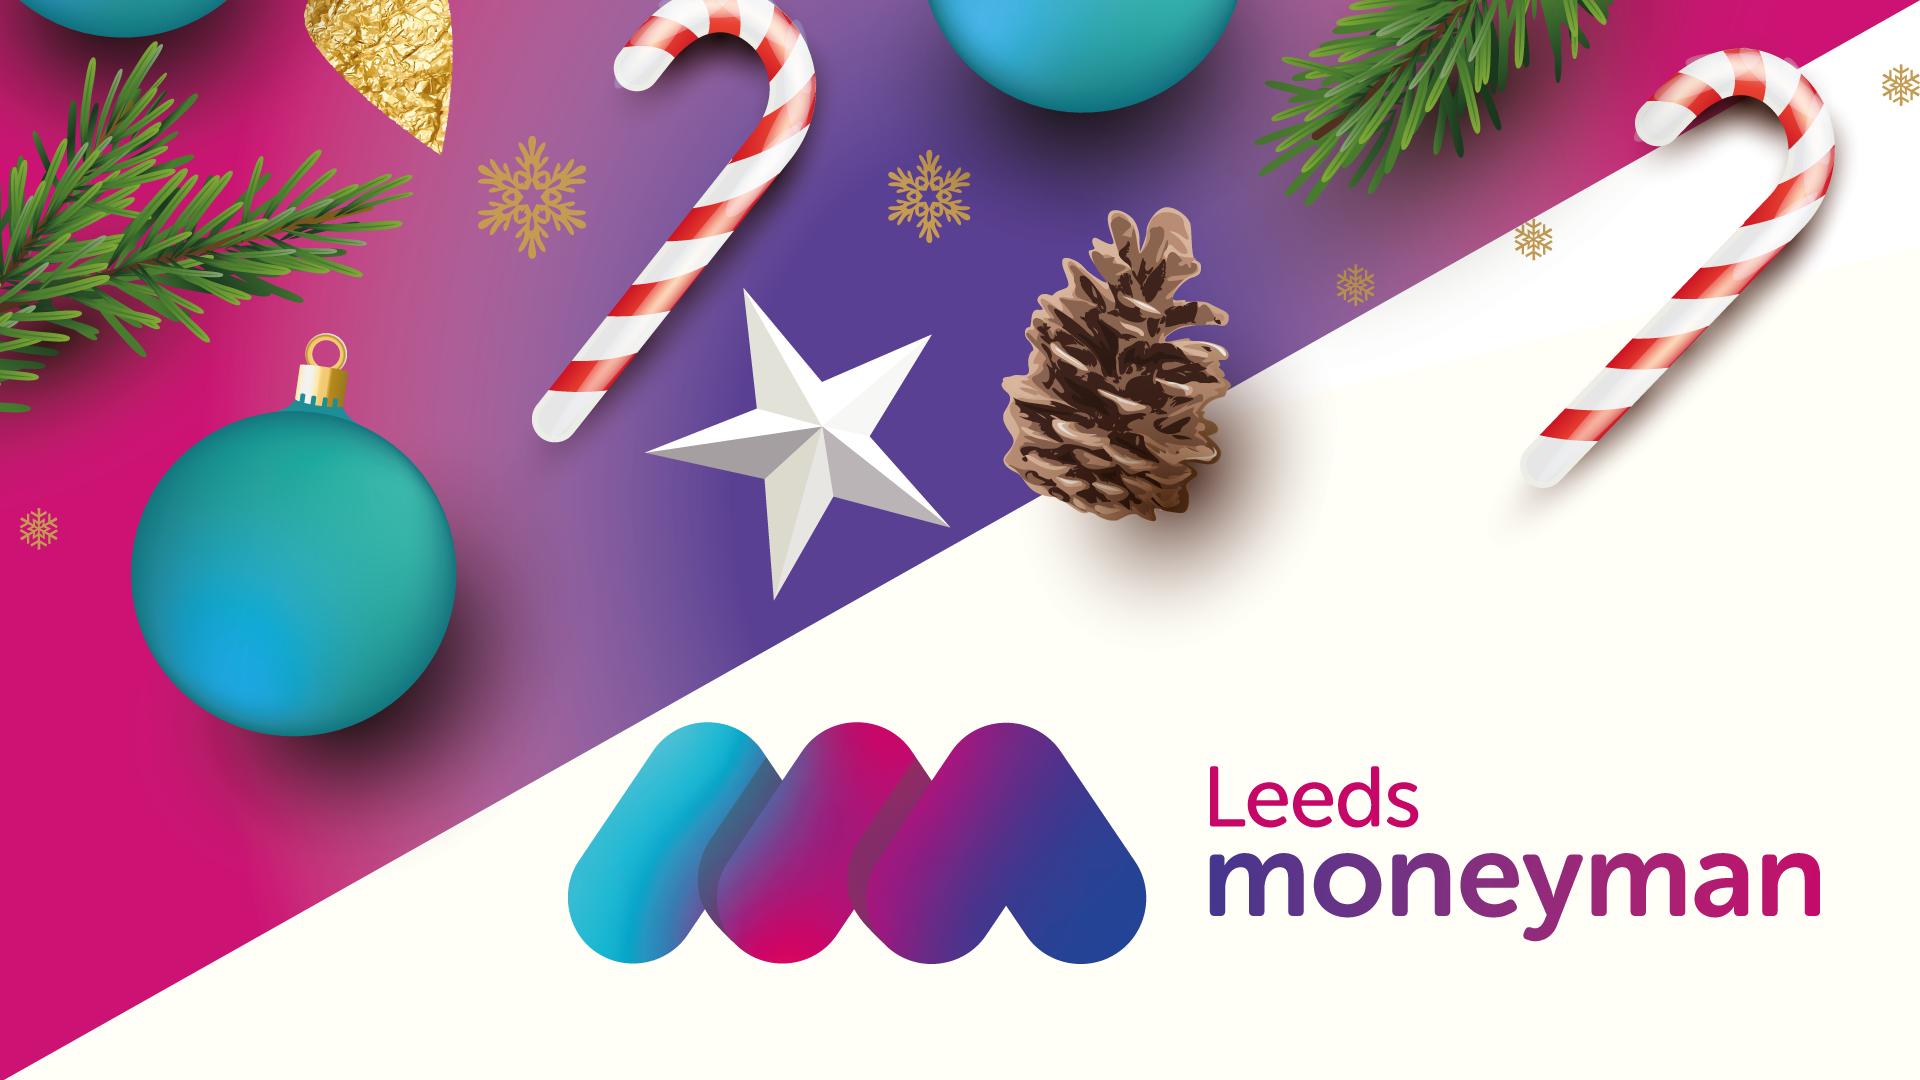 Leedsmoneyman Christmas Message